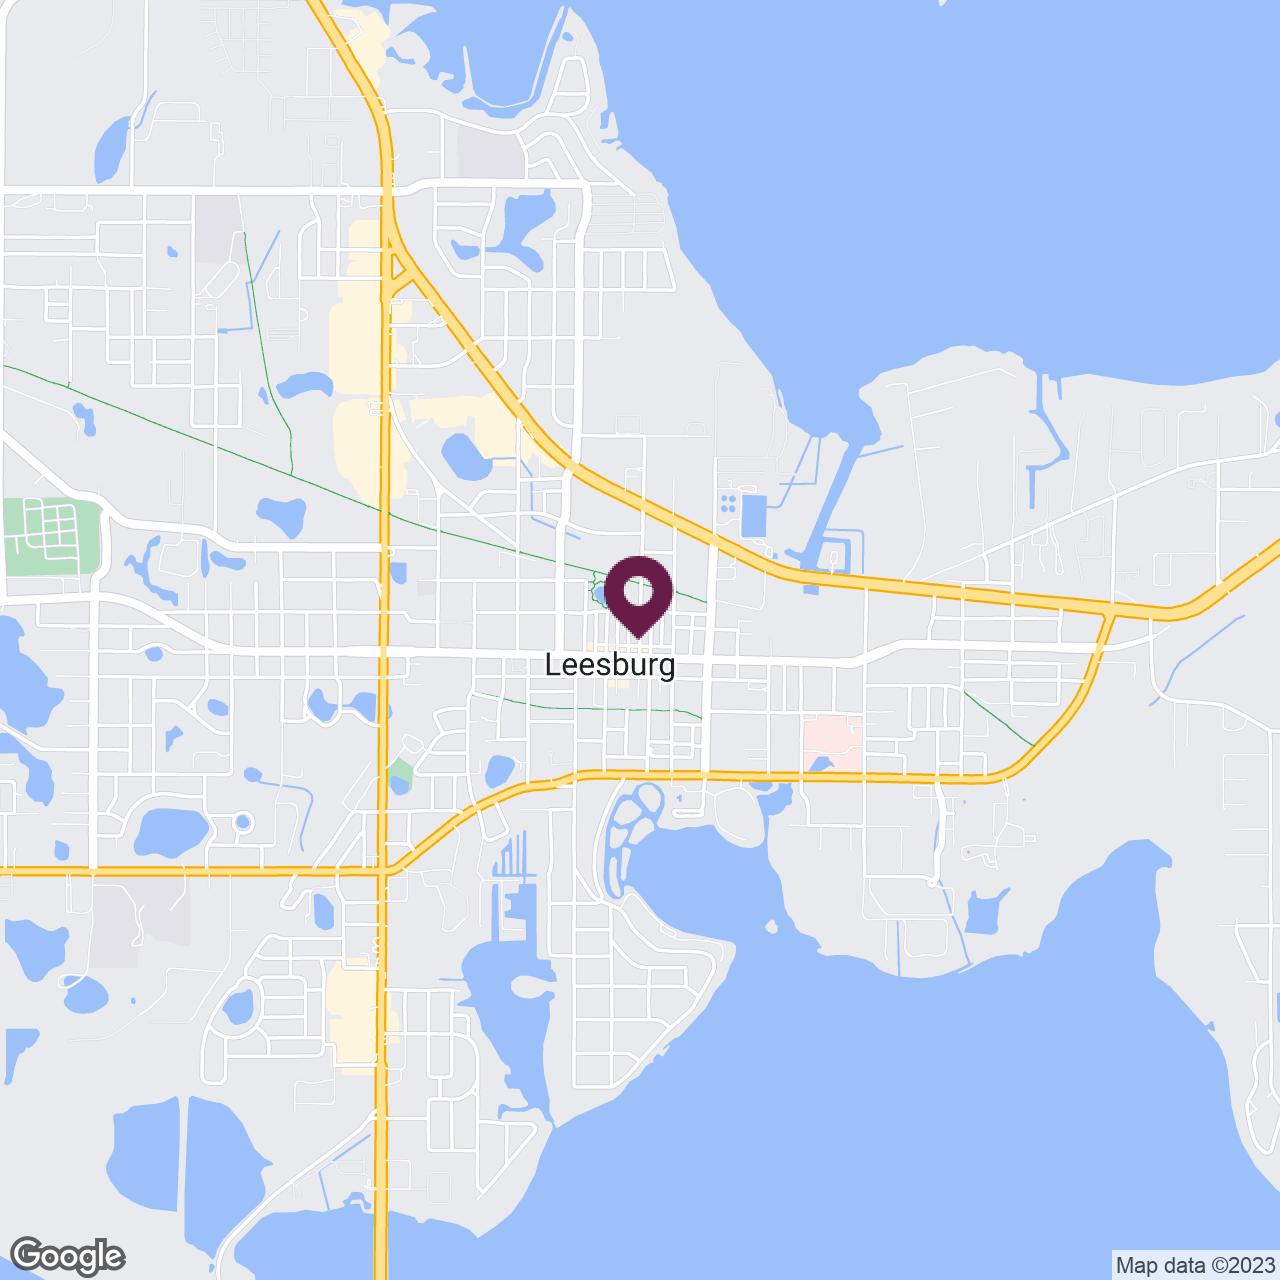 Google Maps static image of The Villages, Leesburg, Tavares, Eustis